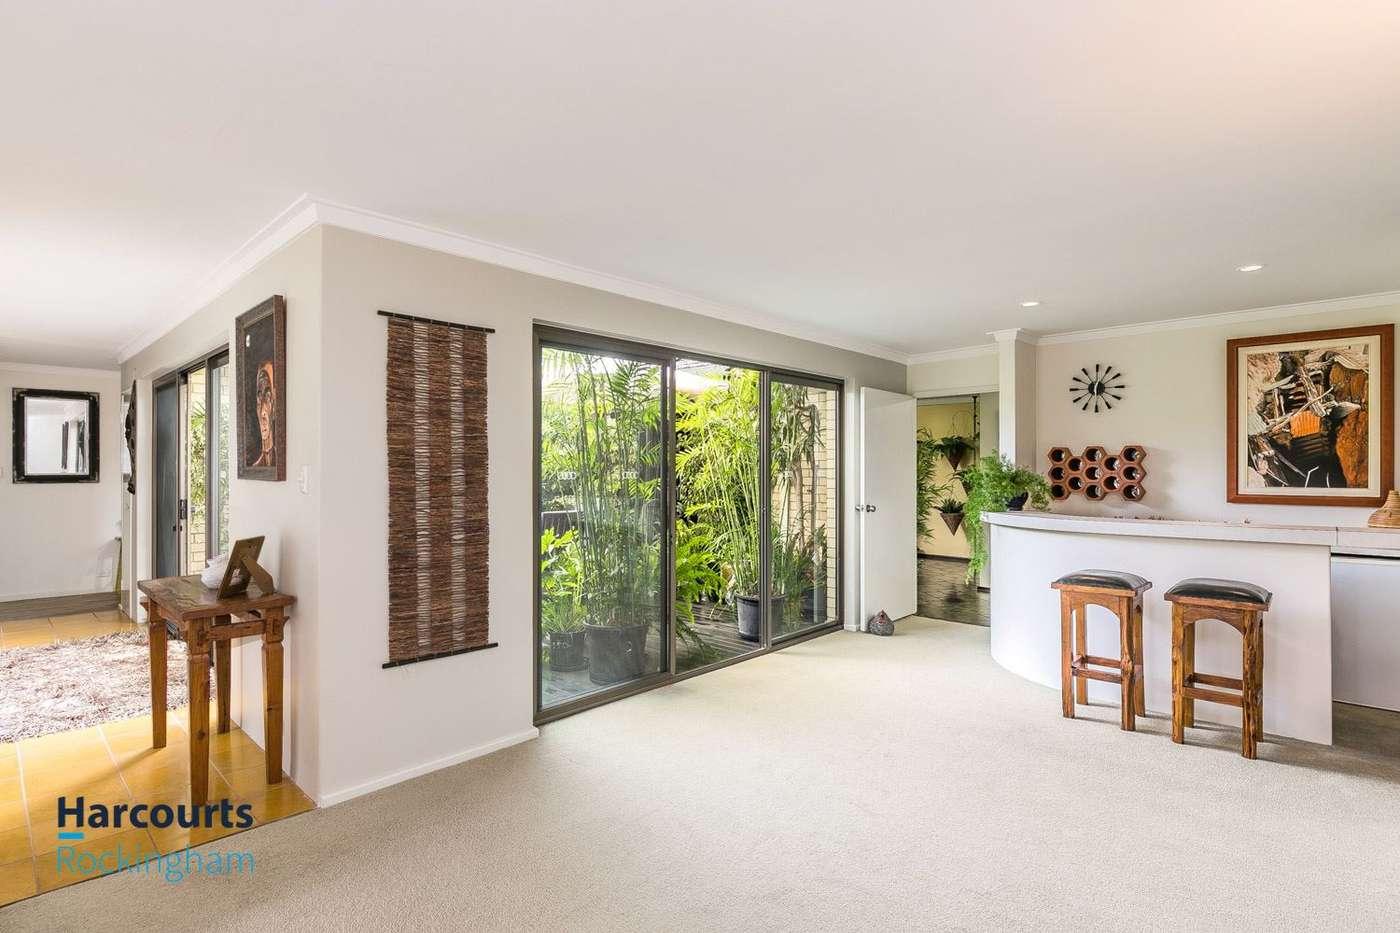 Main view of Homely house listing, 13 Barbrook Way, Warnbro, WA 6169